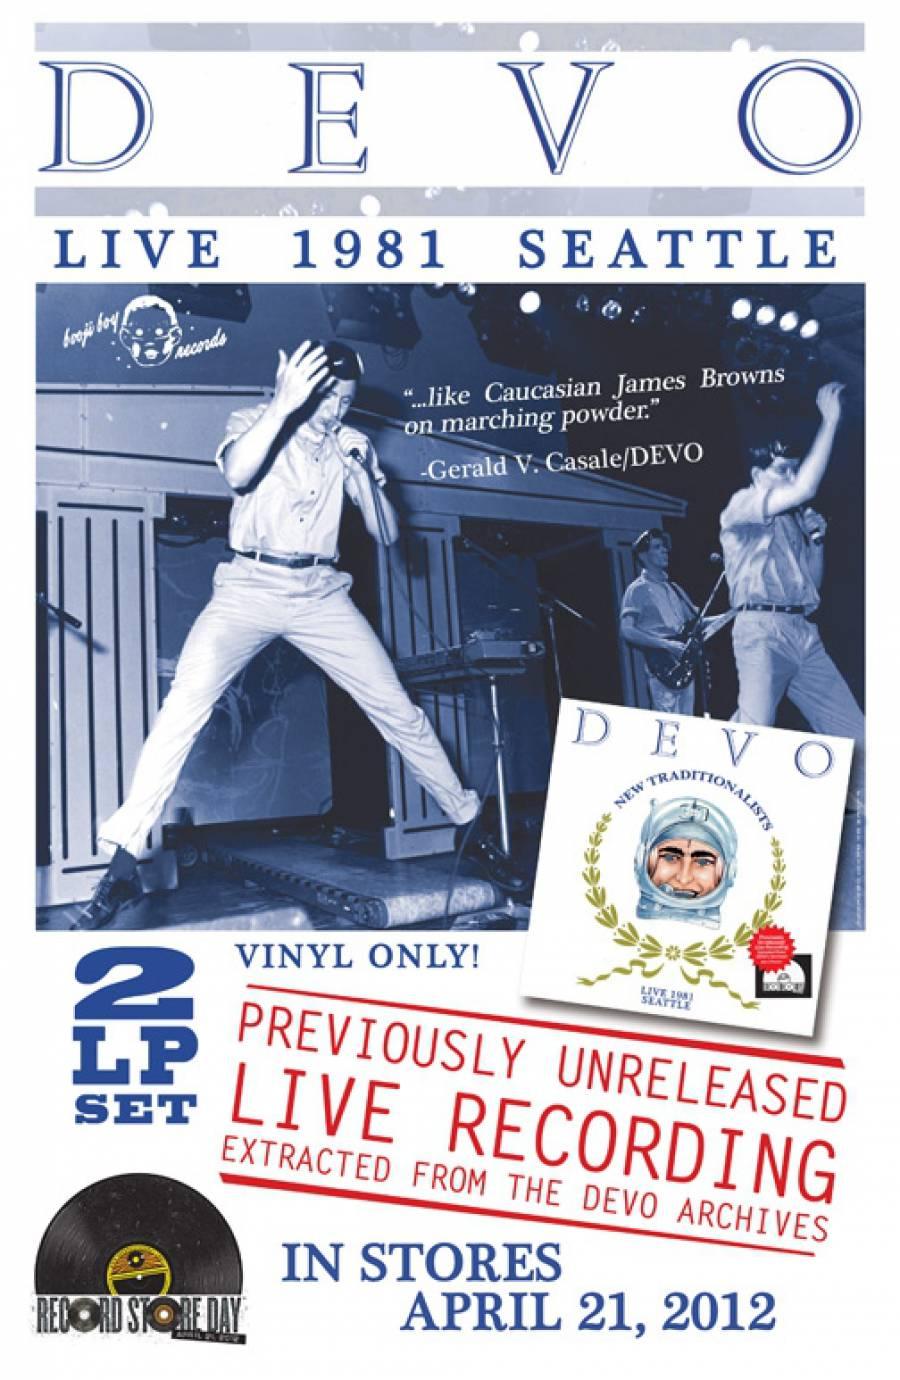 Flyer for DEVO Live 1981 Vinyl Release